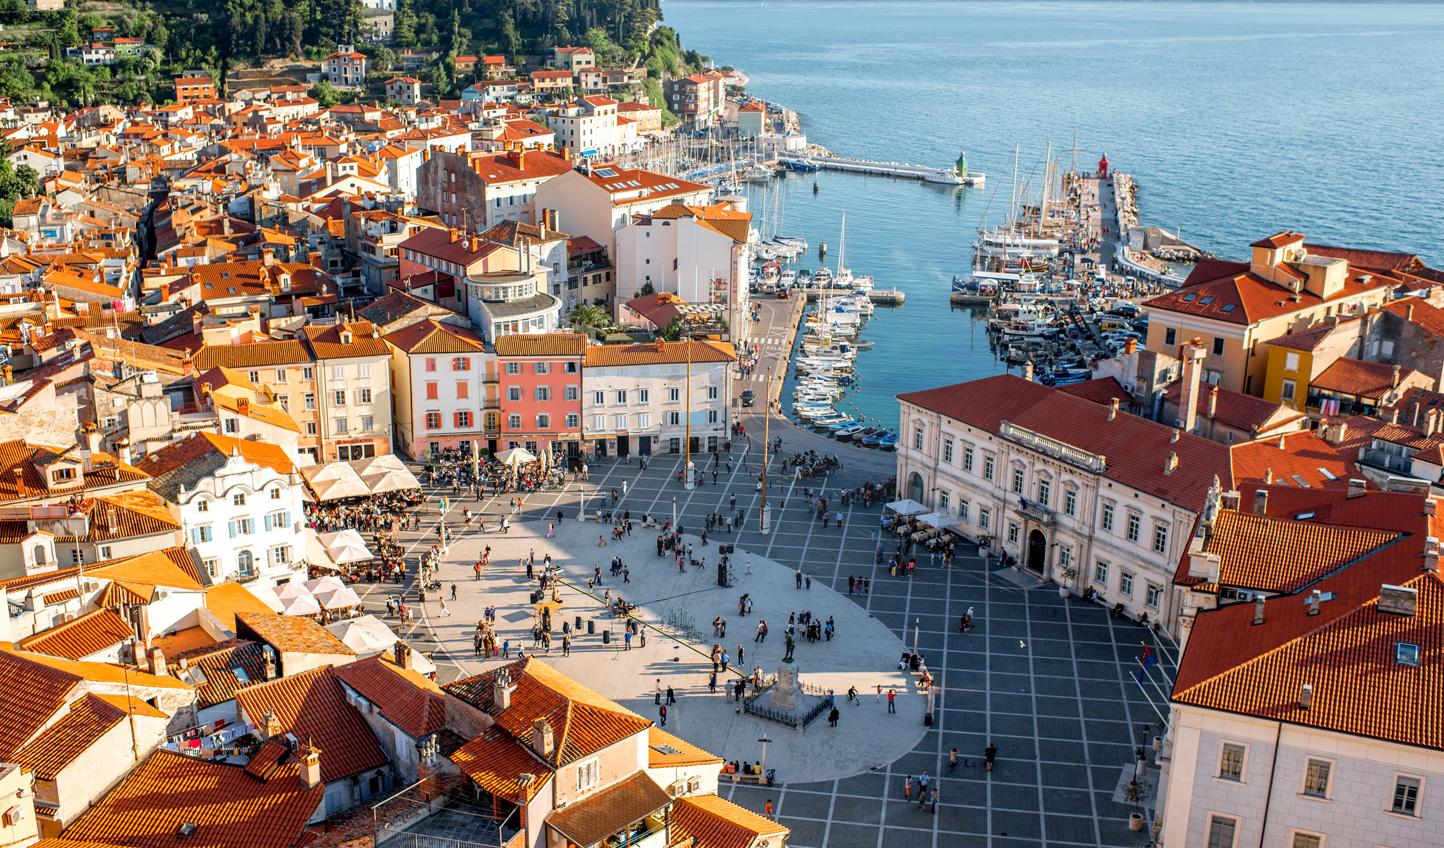 Explore the coastal fishing charm of Piran